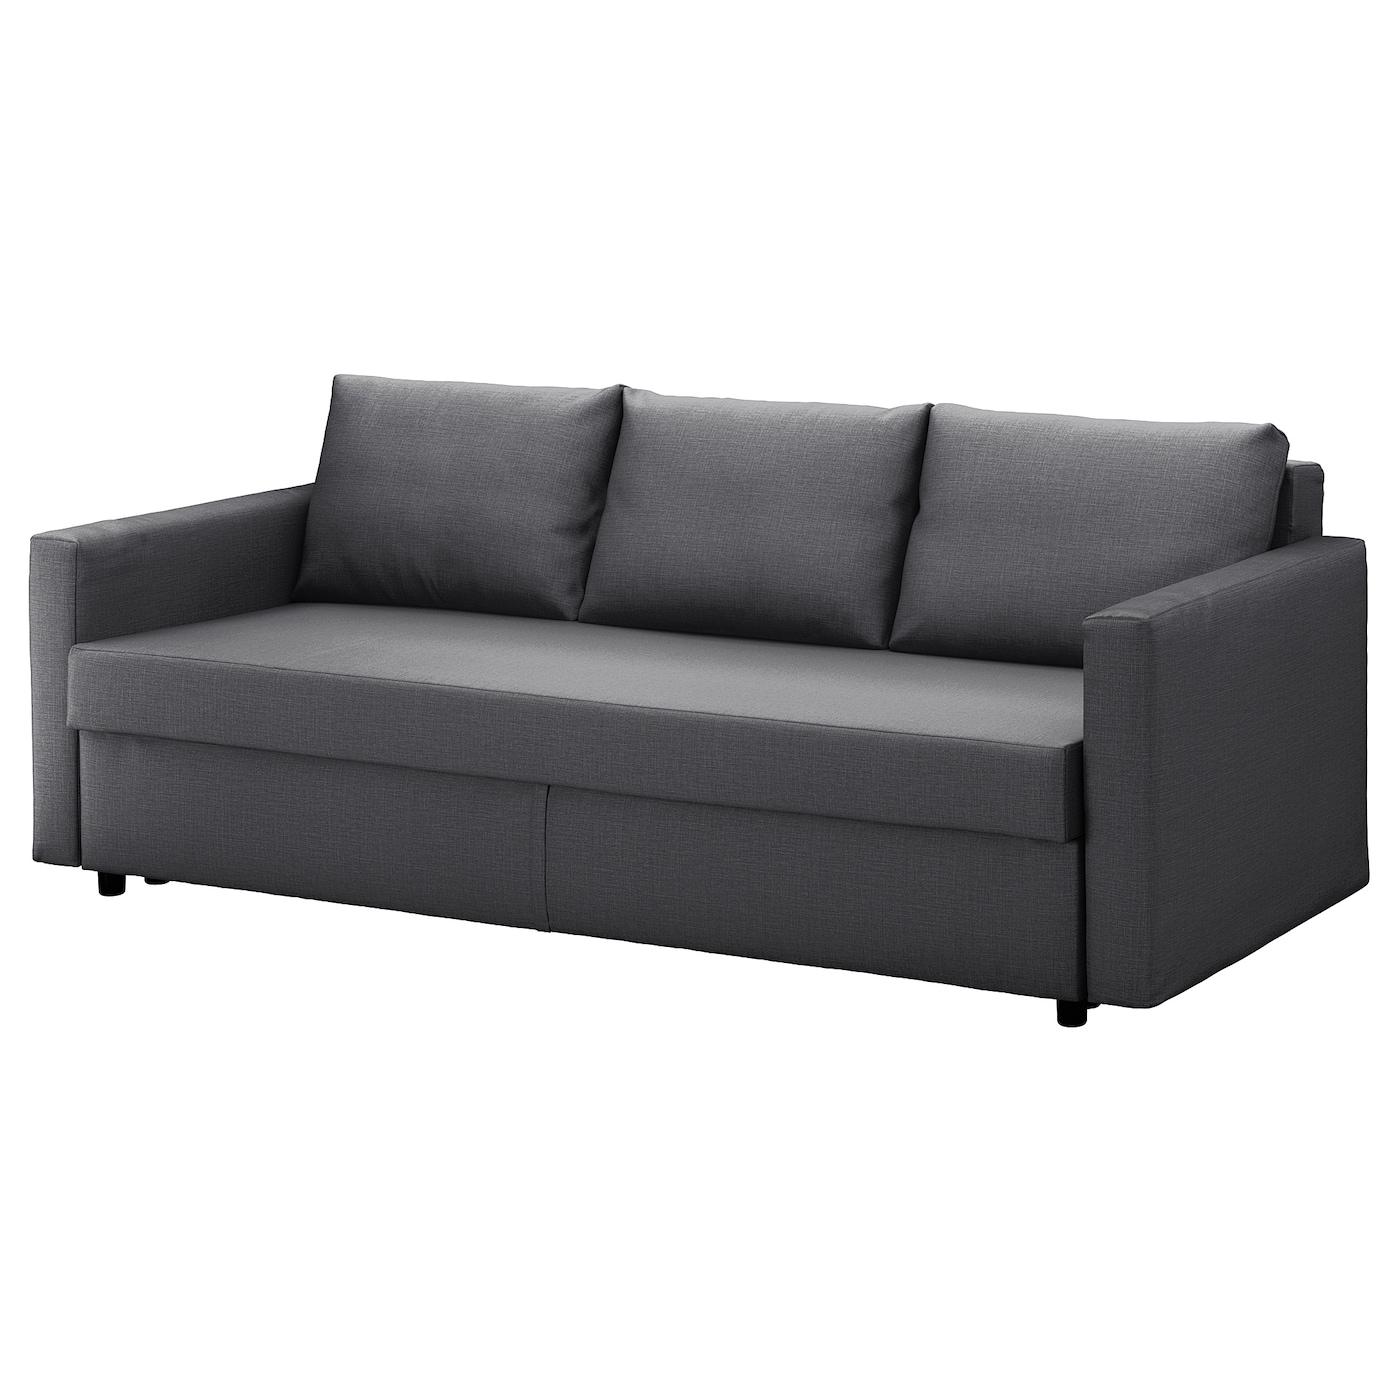 Dark Grey Three BedSkiftebo Friheten Sofa Seat 1JcFT5lK3u